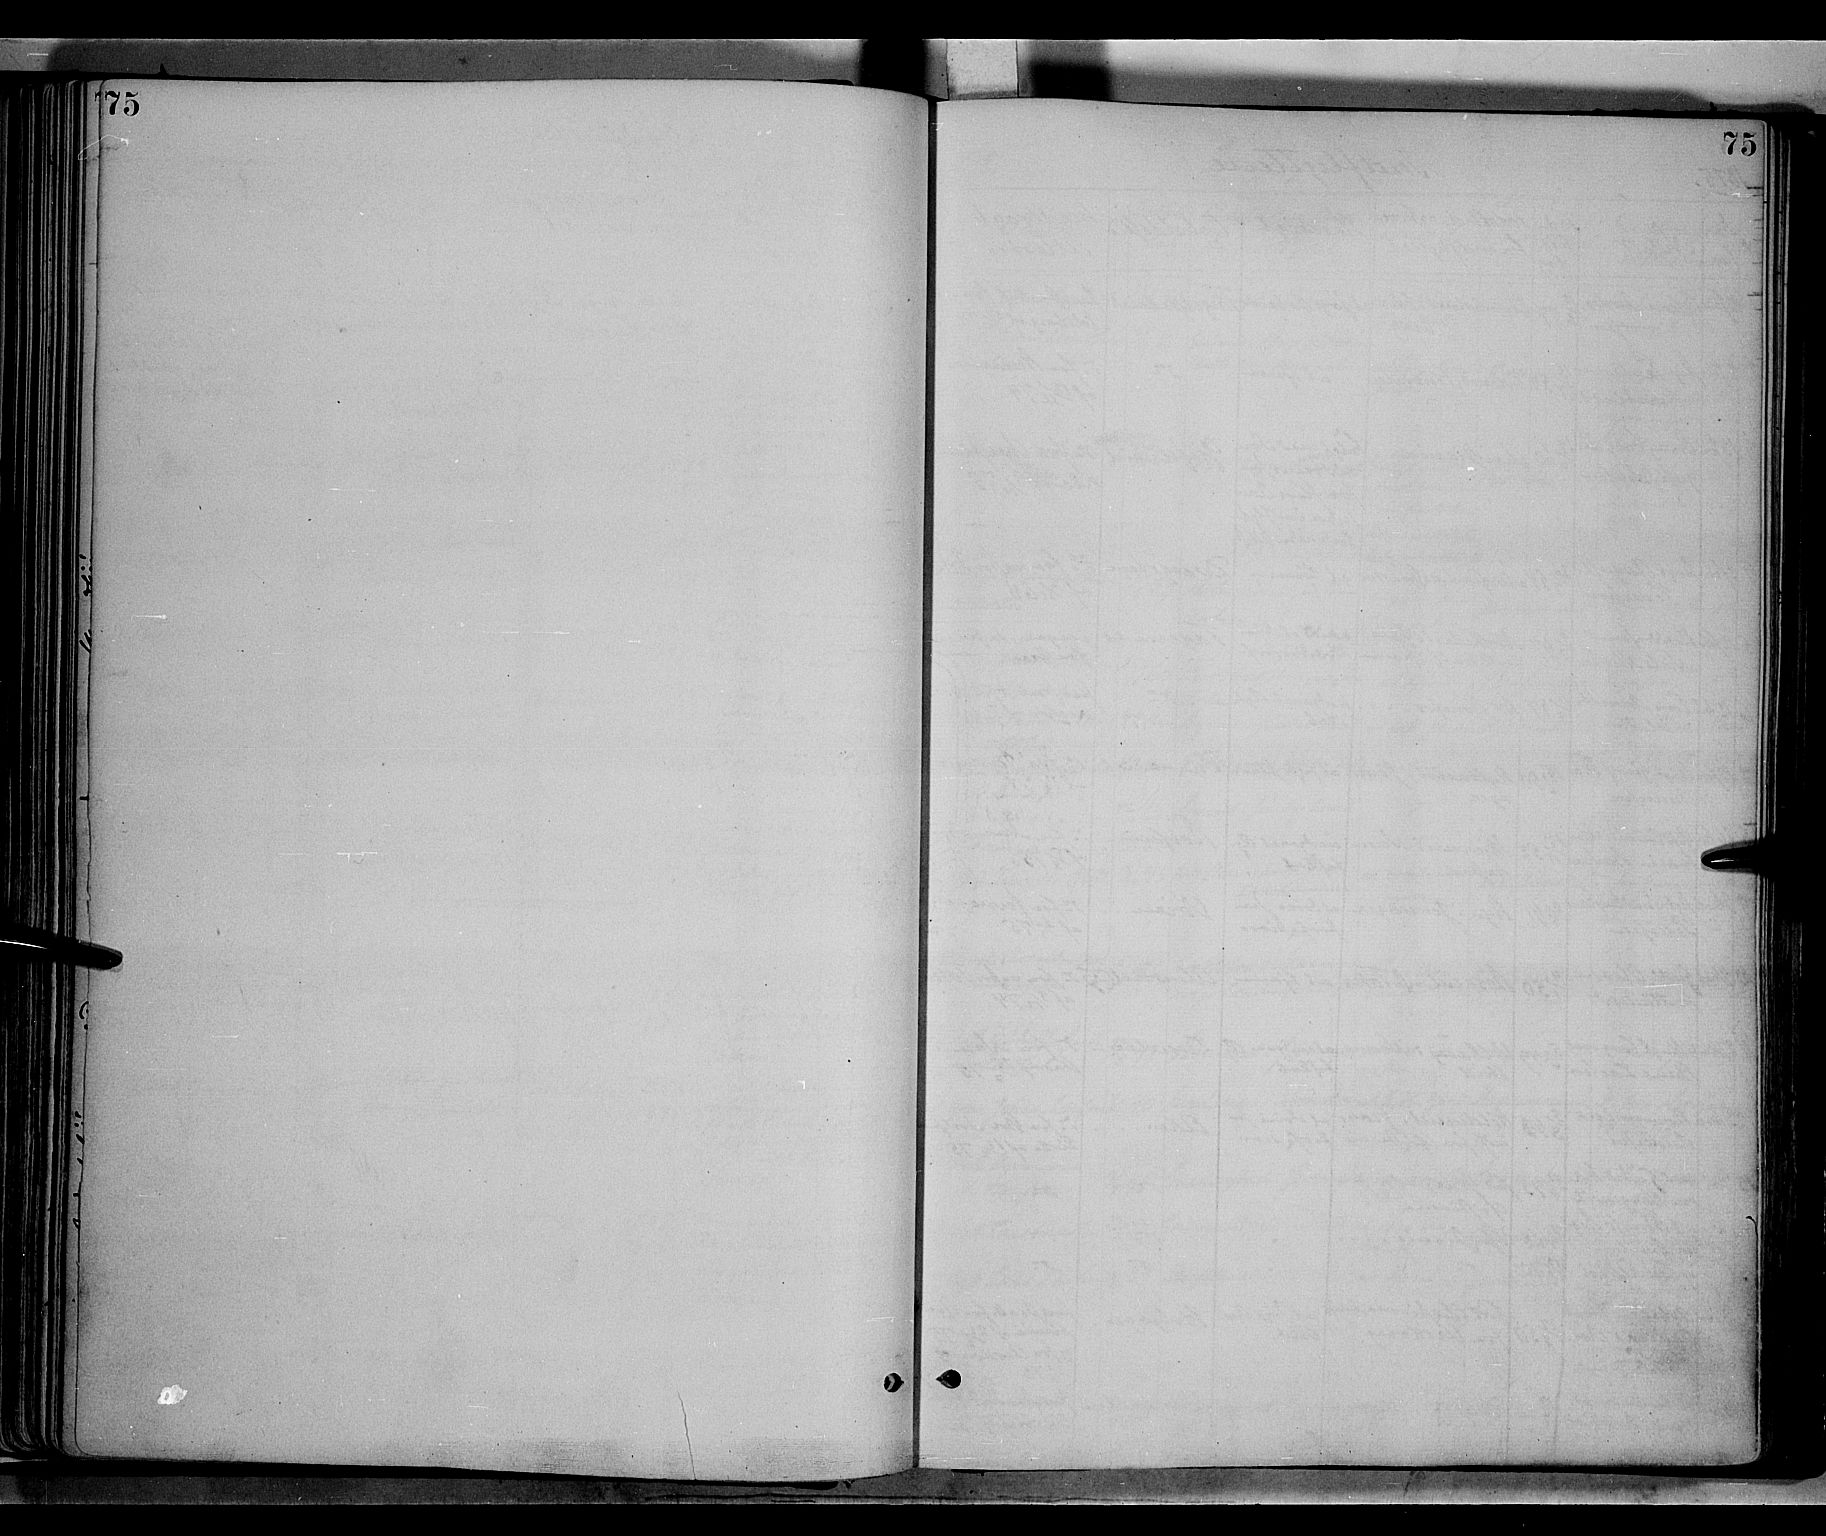 SAH, Gran prestekontor, Ministerialbok nr. 13, 1875-1879, s. 75